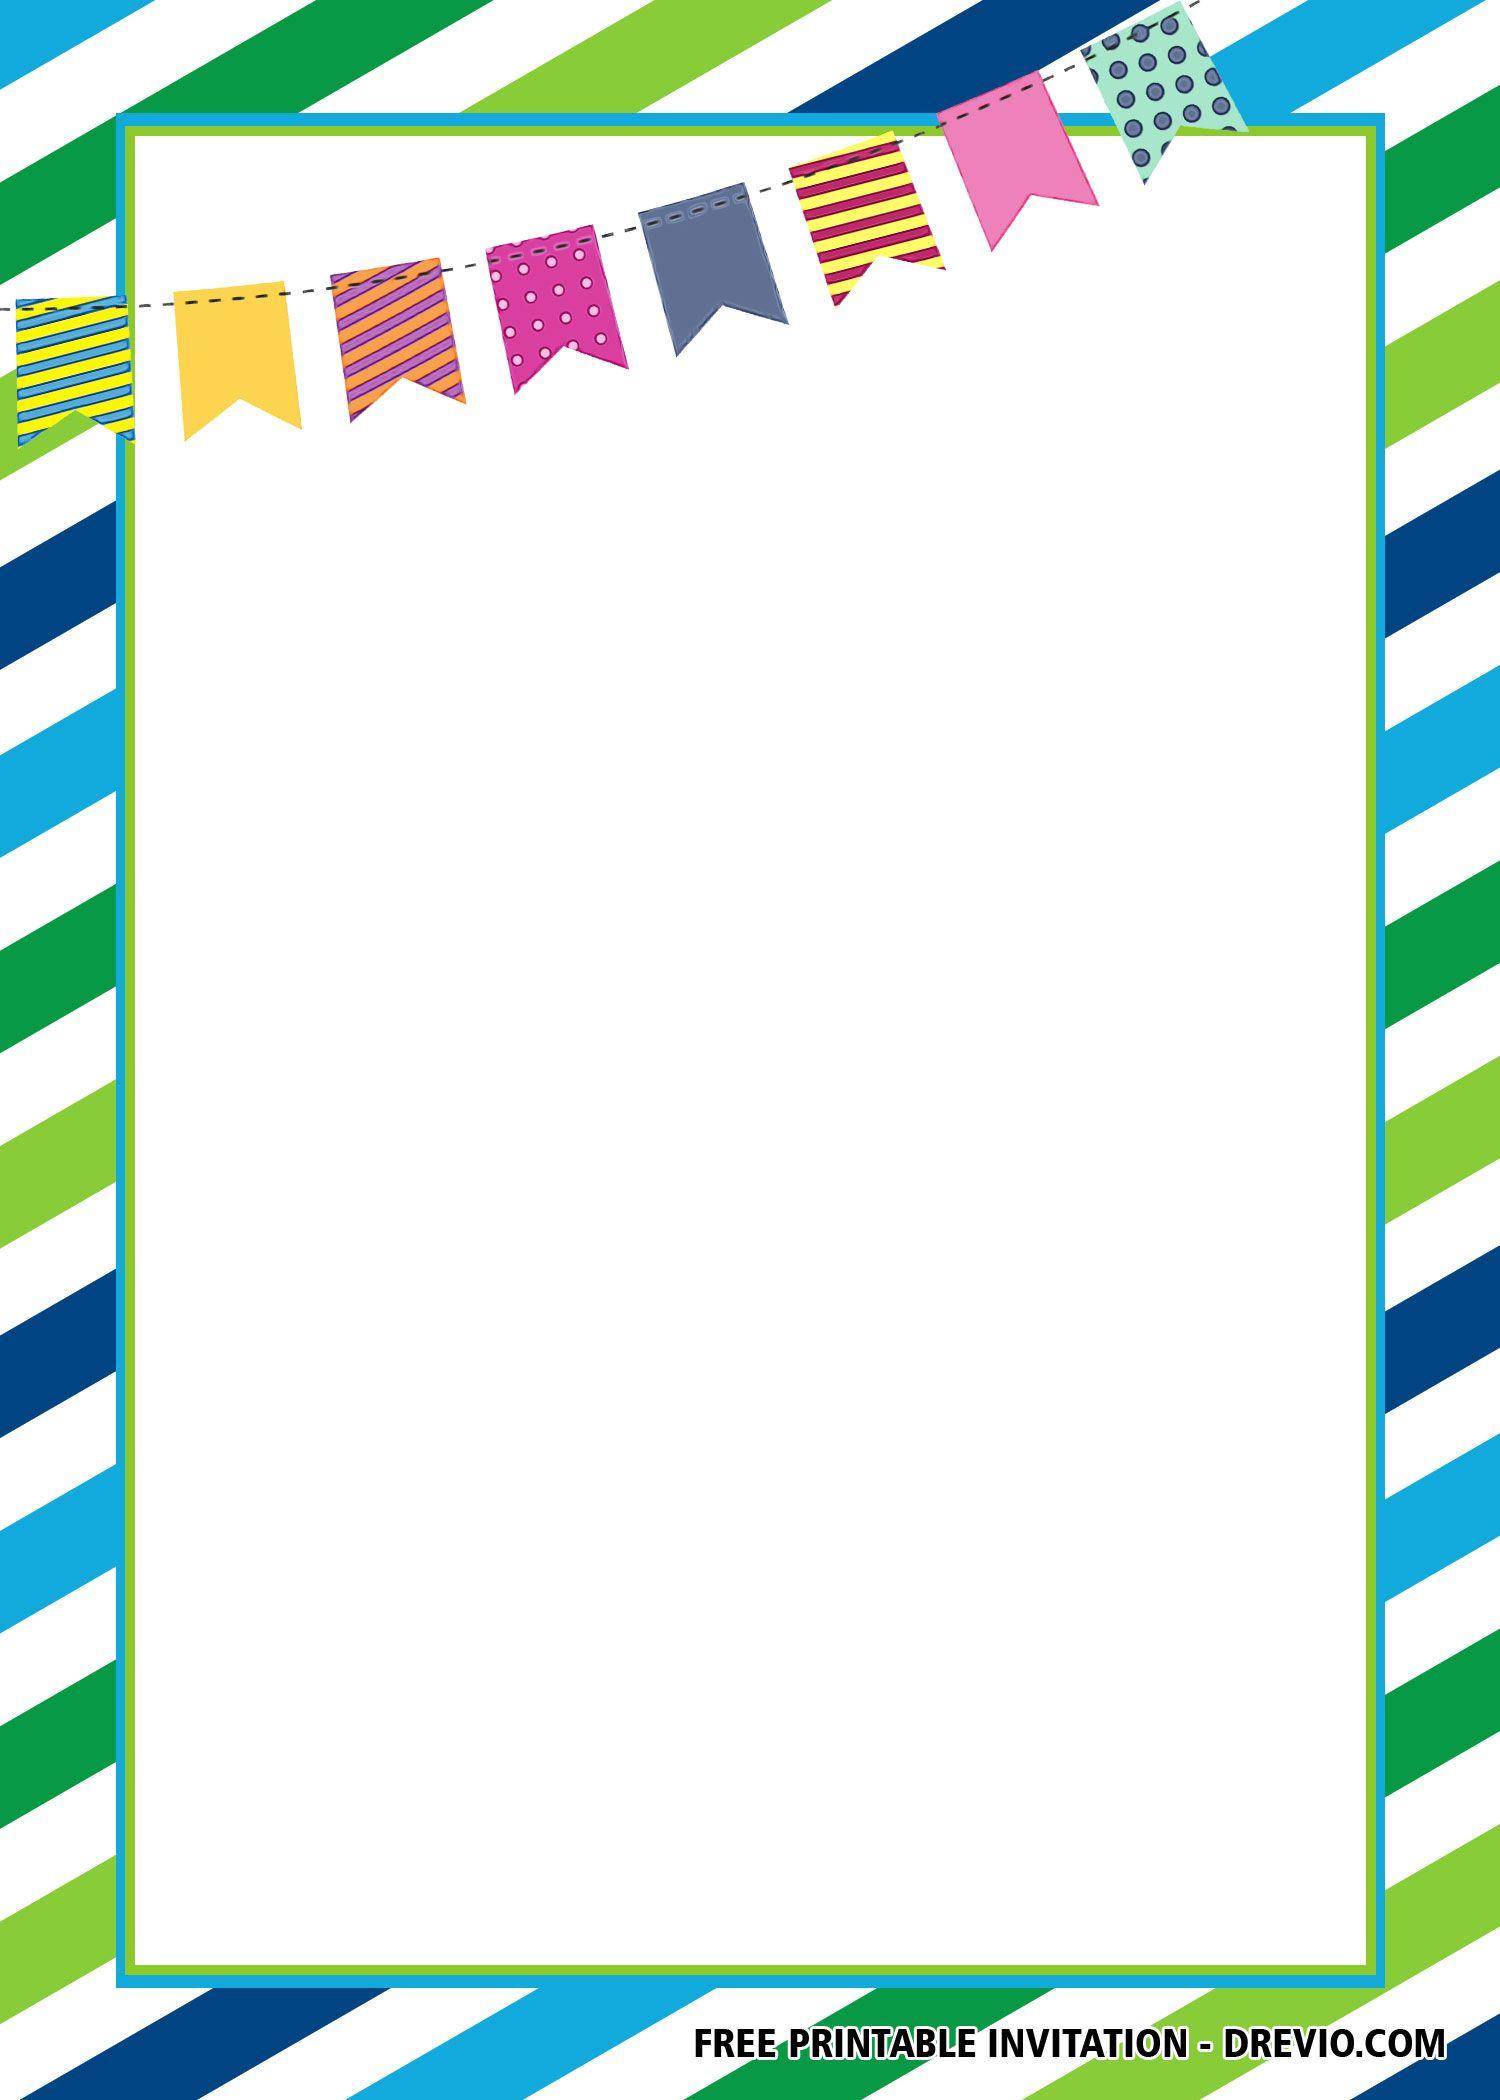 Free Blue Green Invitation Templates Free Printable Baby Shower Invitations Green Invitations Printable Baby Shower Invitations